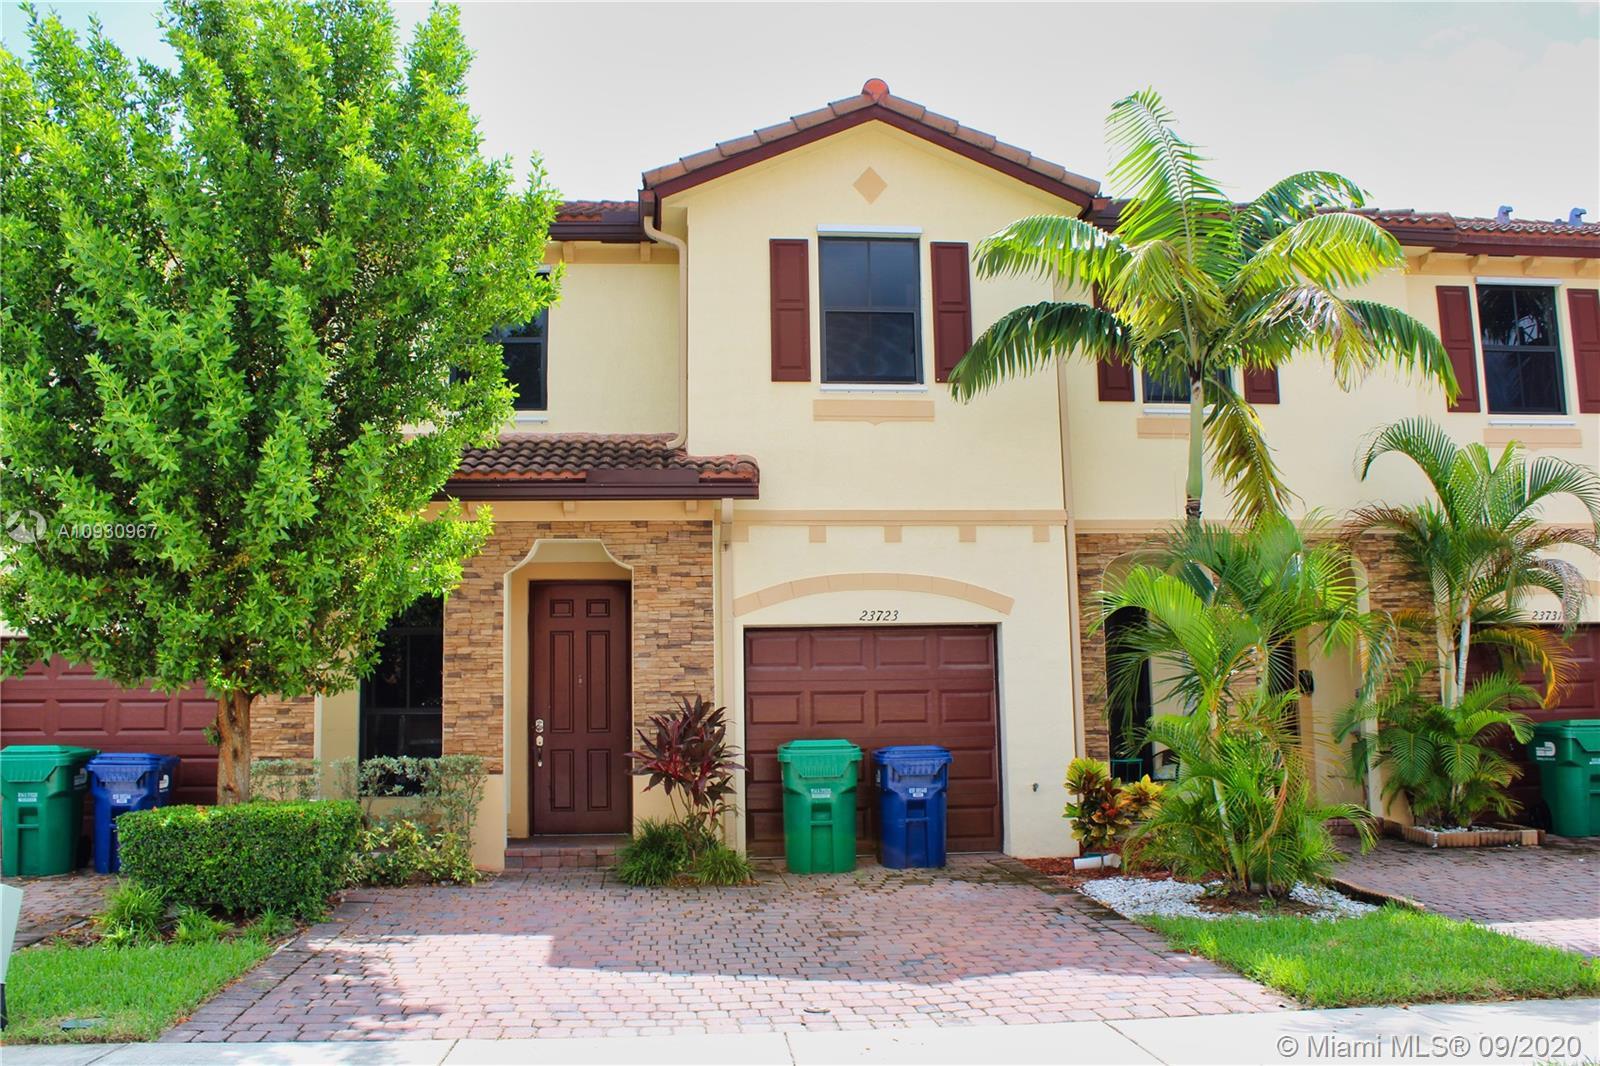 23723 Sw 117th Pl #23723 Property Photo